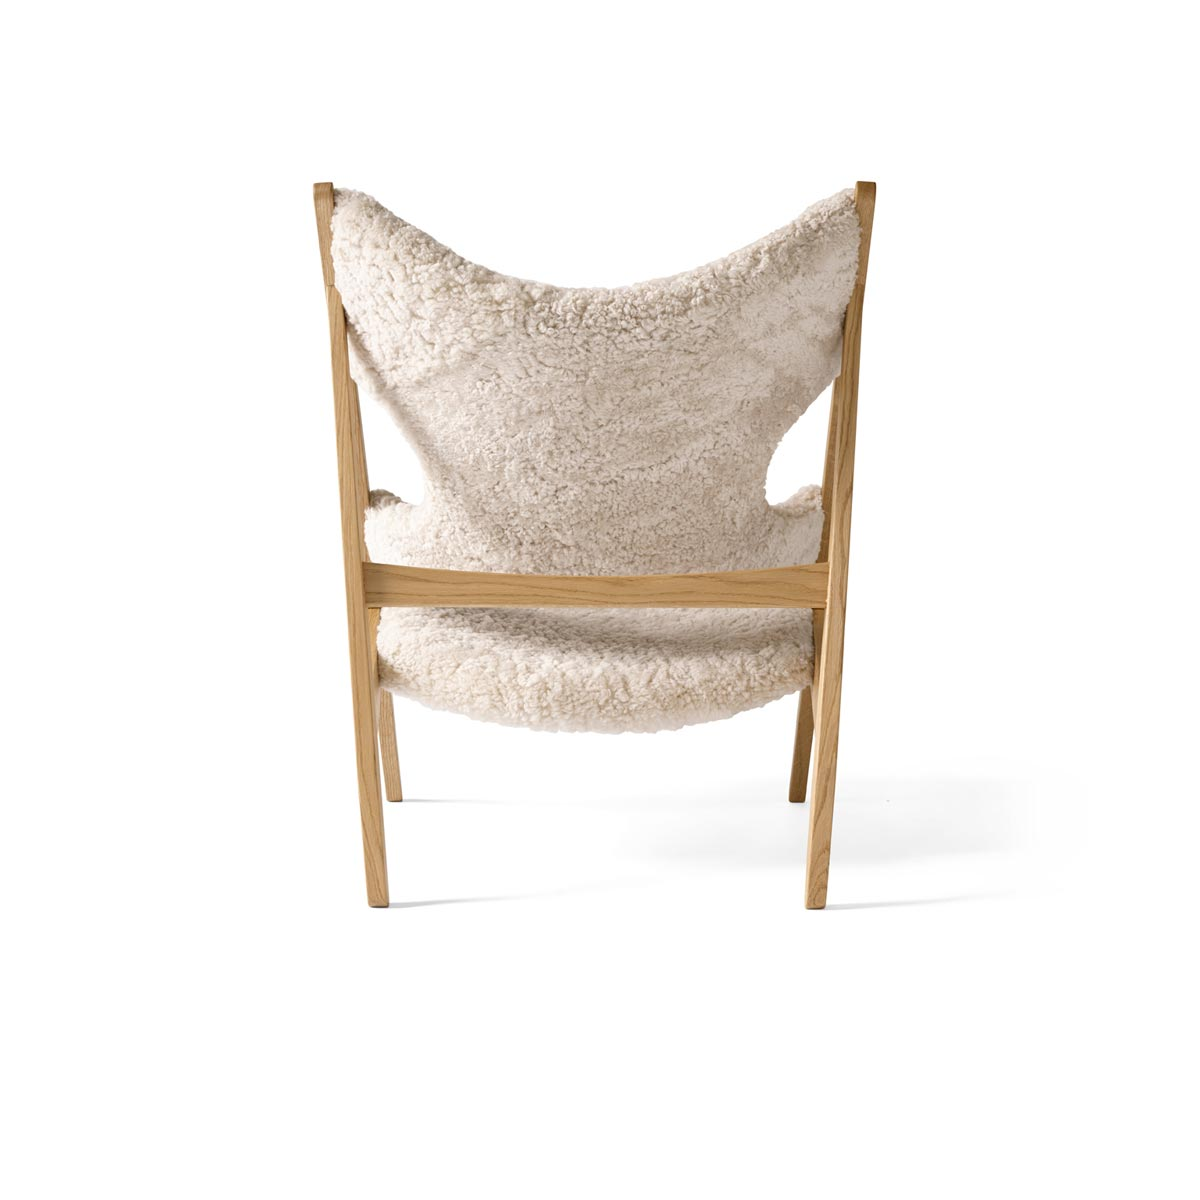 9681649 Knitting Lounge Chair Natural Oak Moonlight 21 Back 1